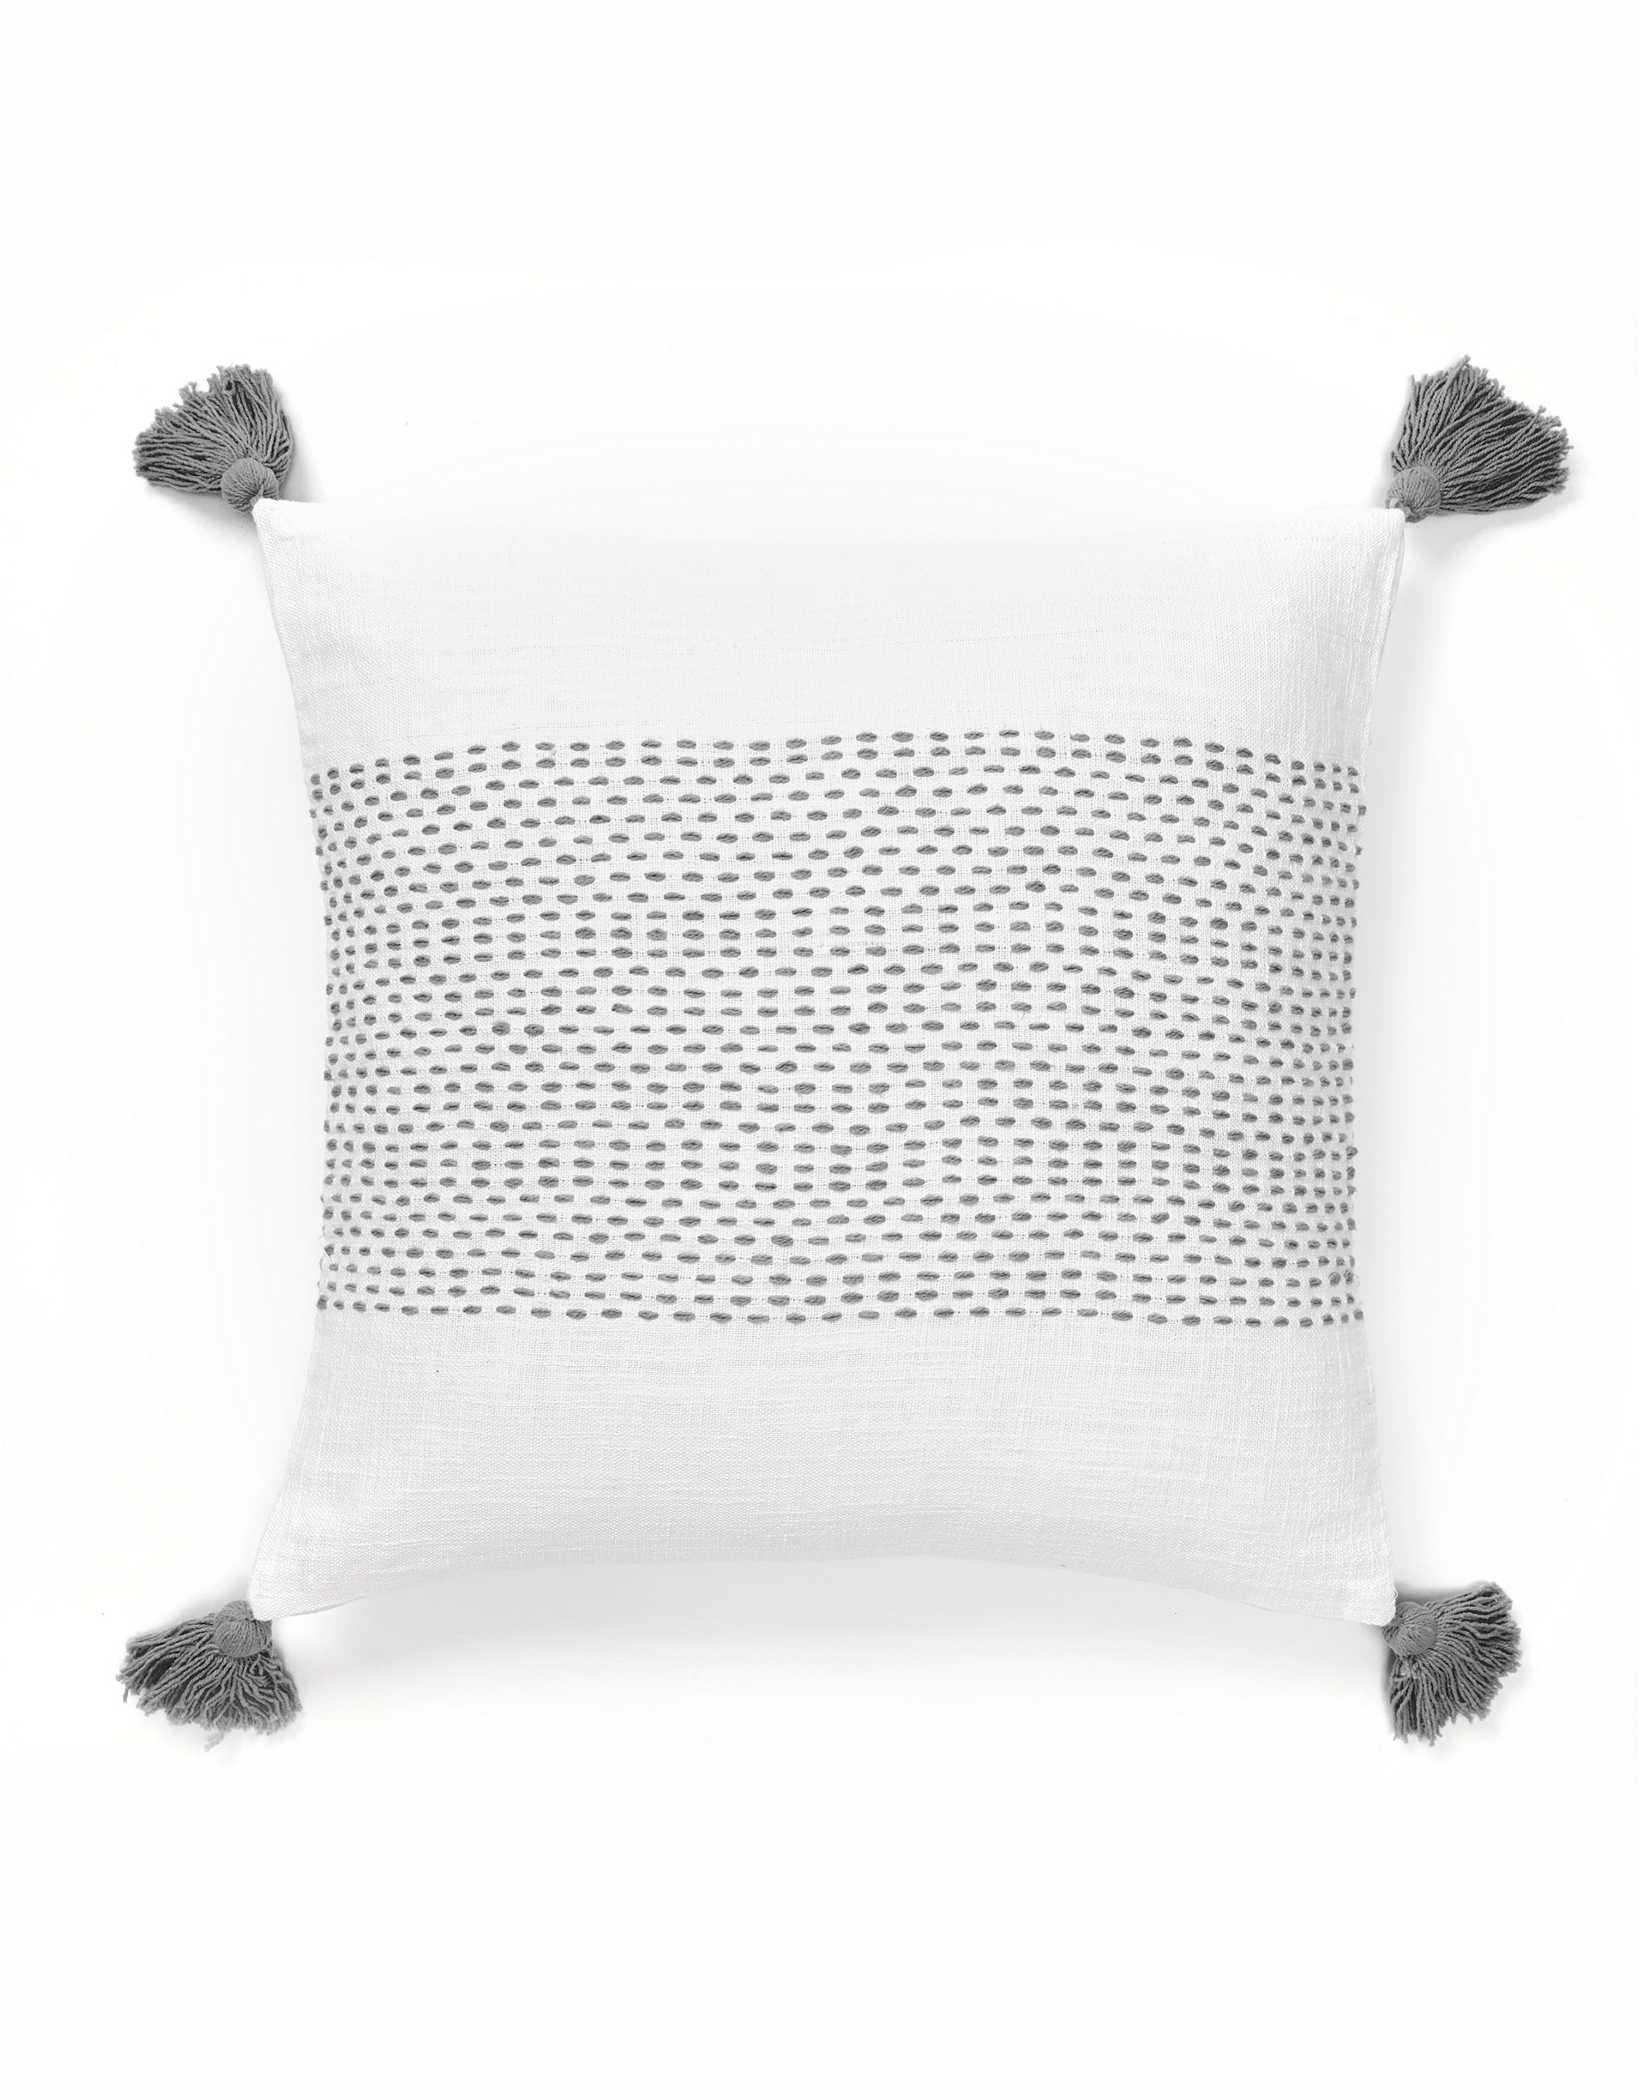 Dormify Woven Tassel Pillow